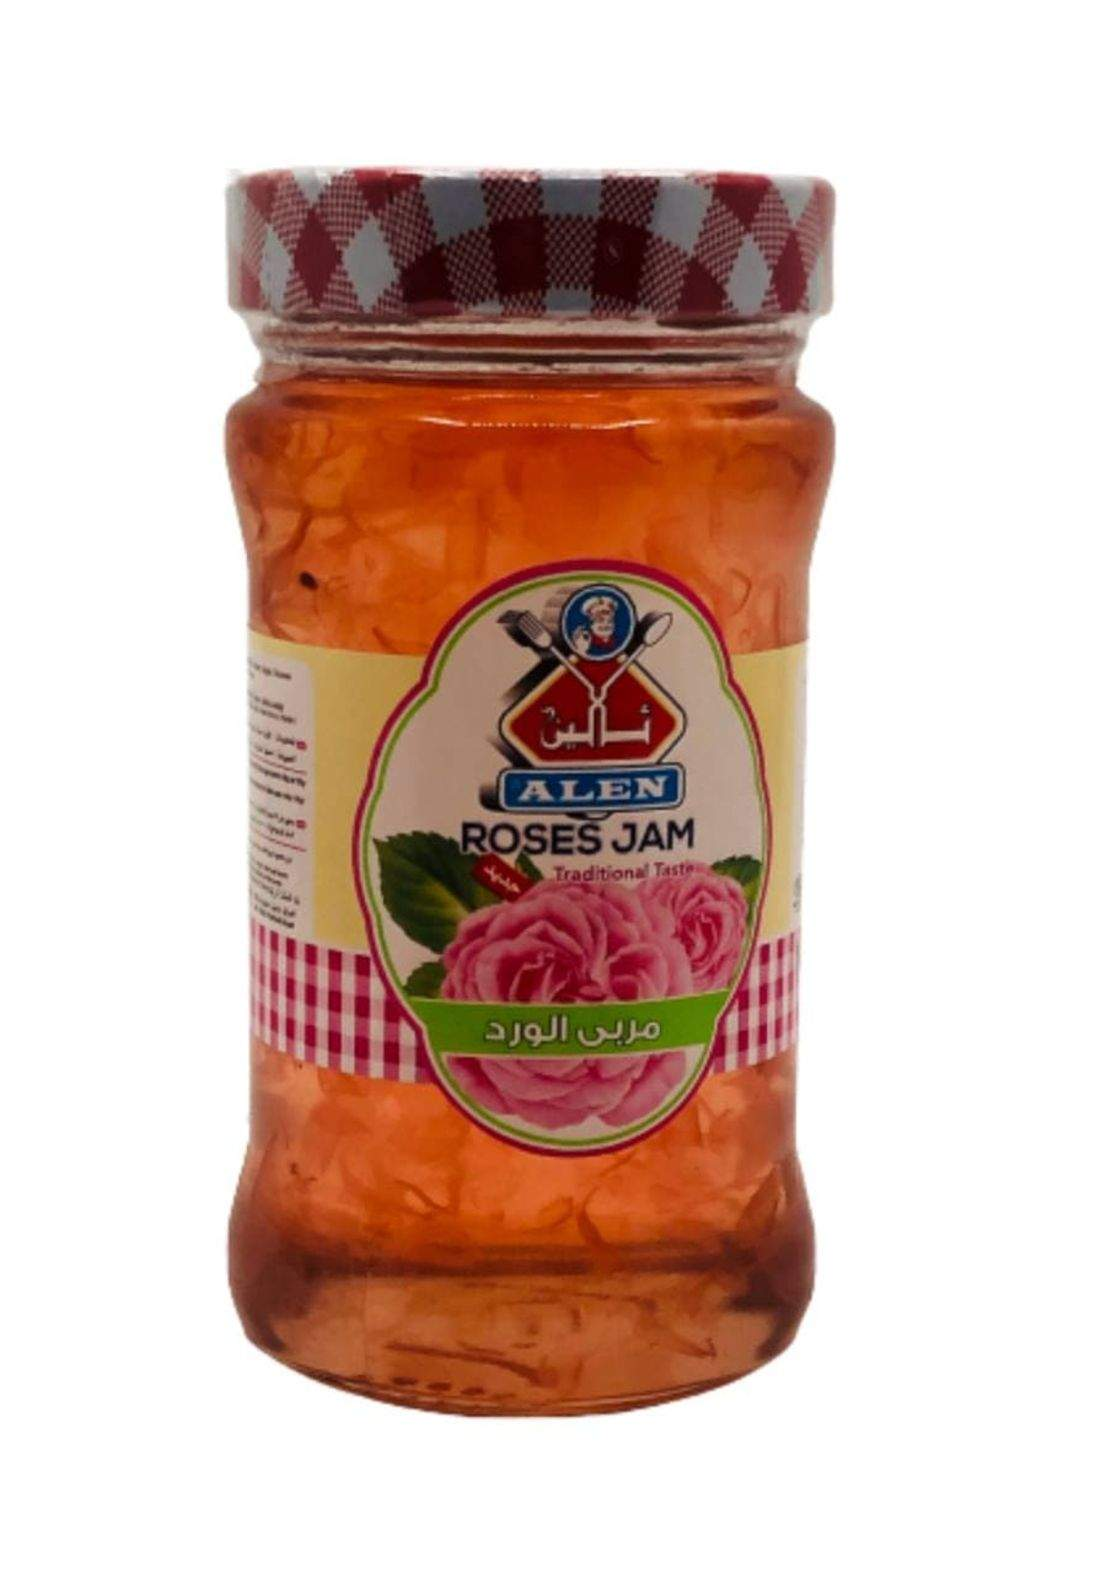 Alen roses jam 380g ئالين مربى الورد